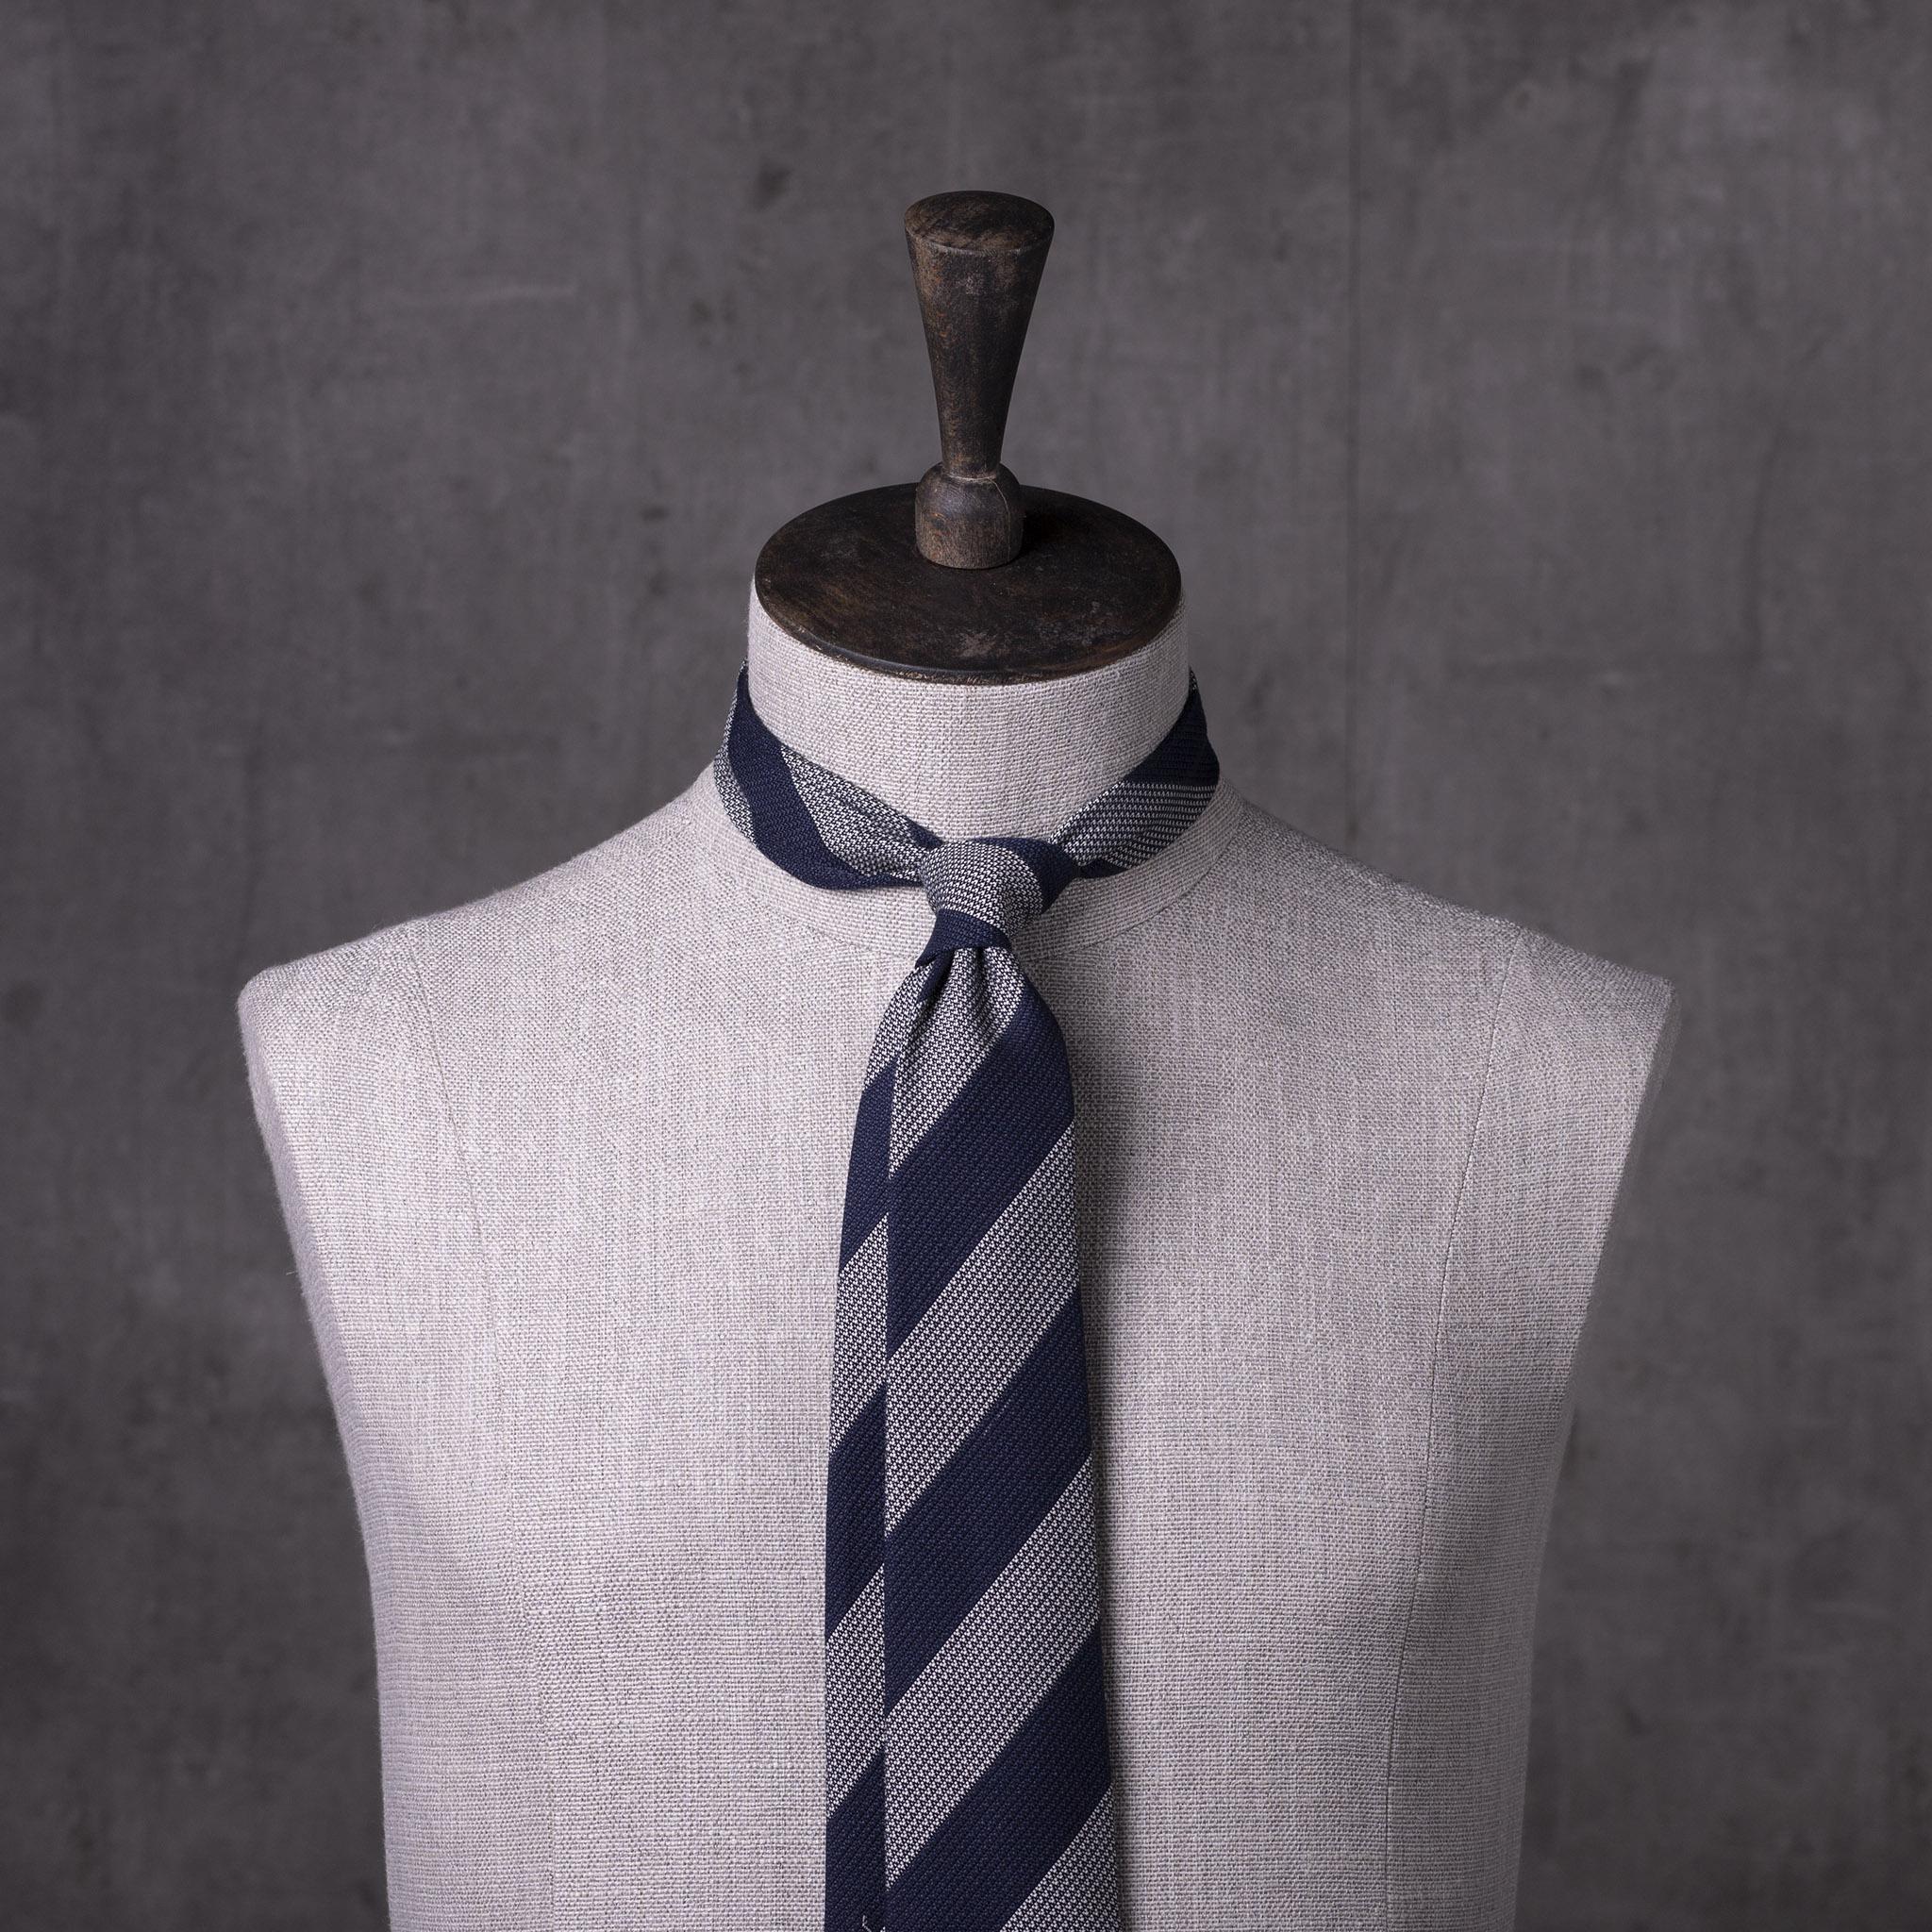 WOOL-SILK-GRENADINE-SEDA-LANA-0481-Tie-Initials-Corbata-Iniciales-The-Seelk-2